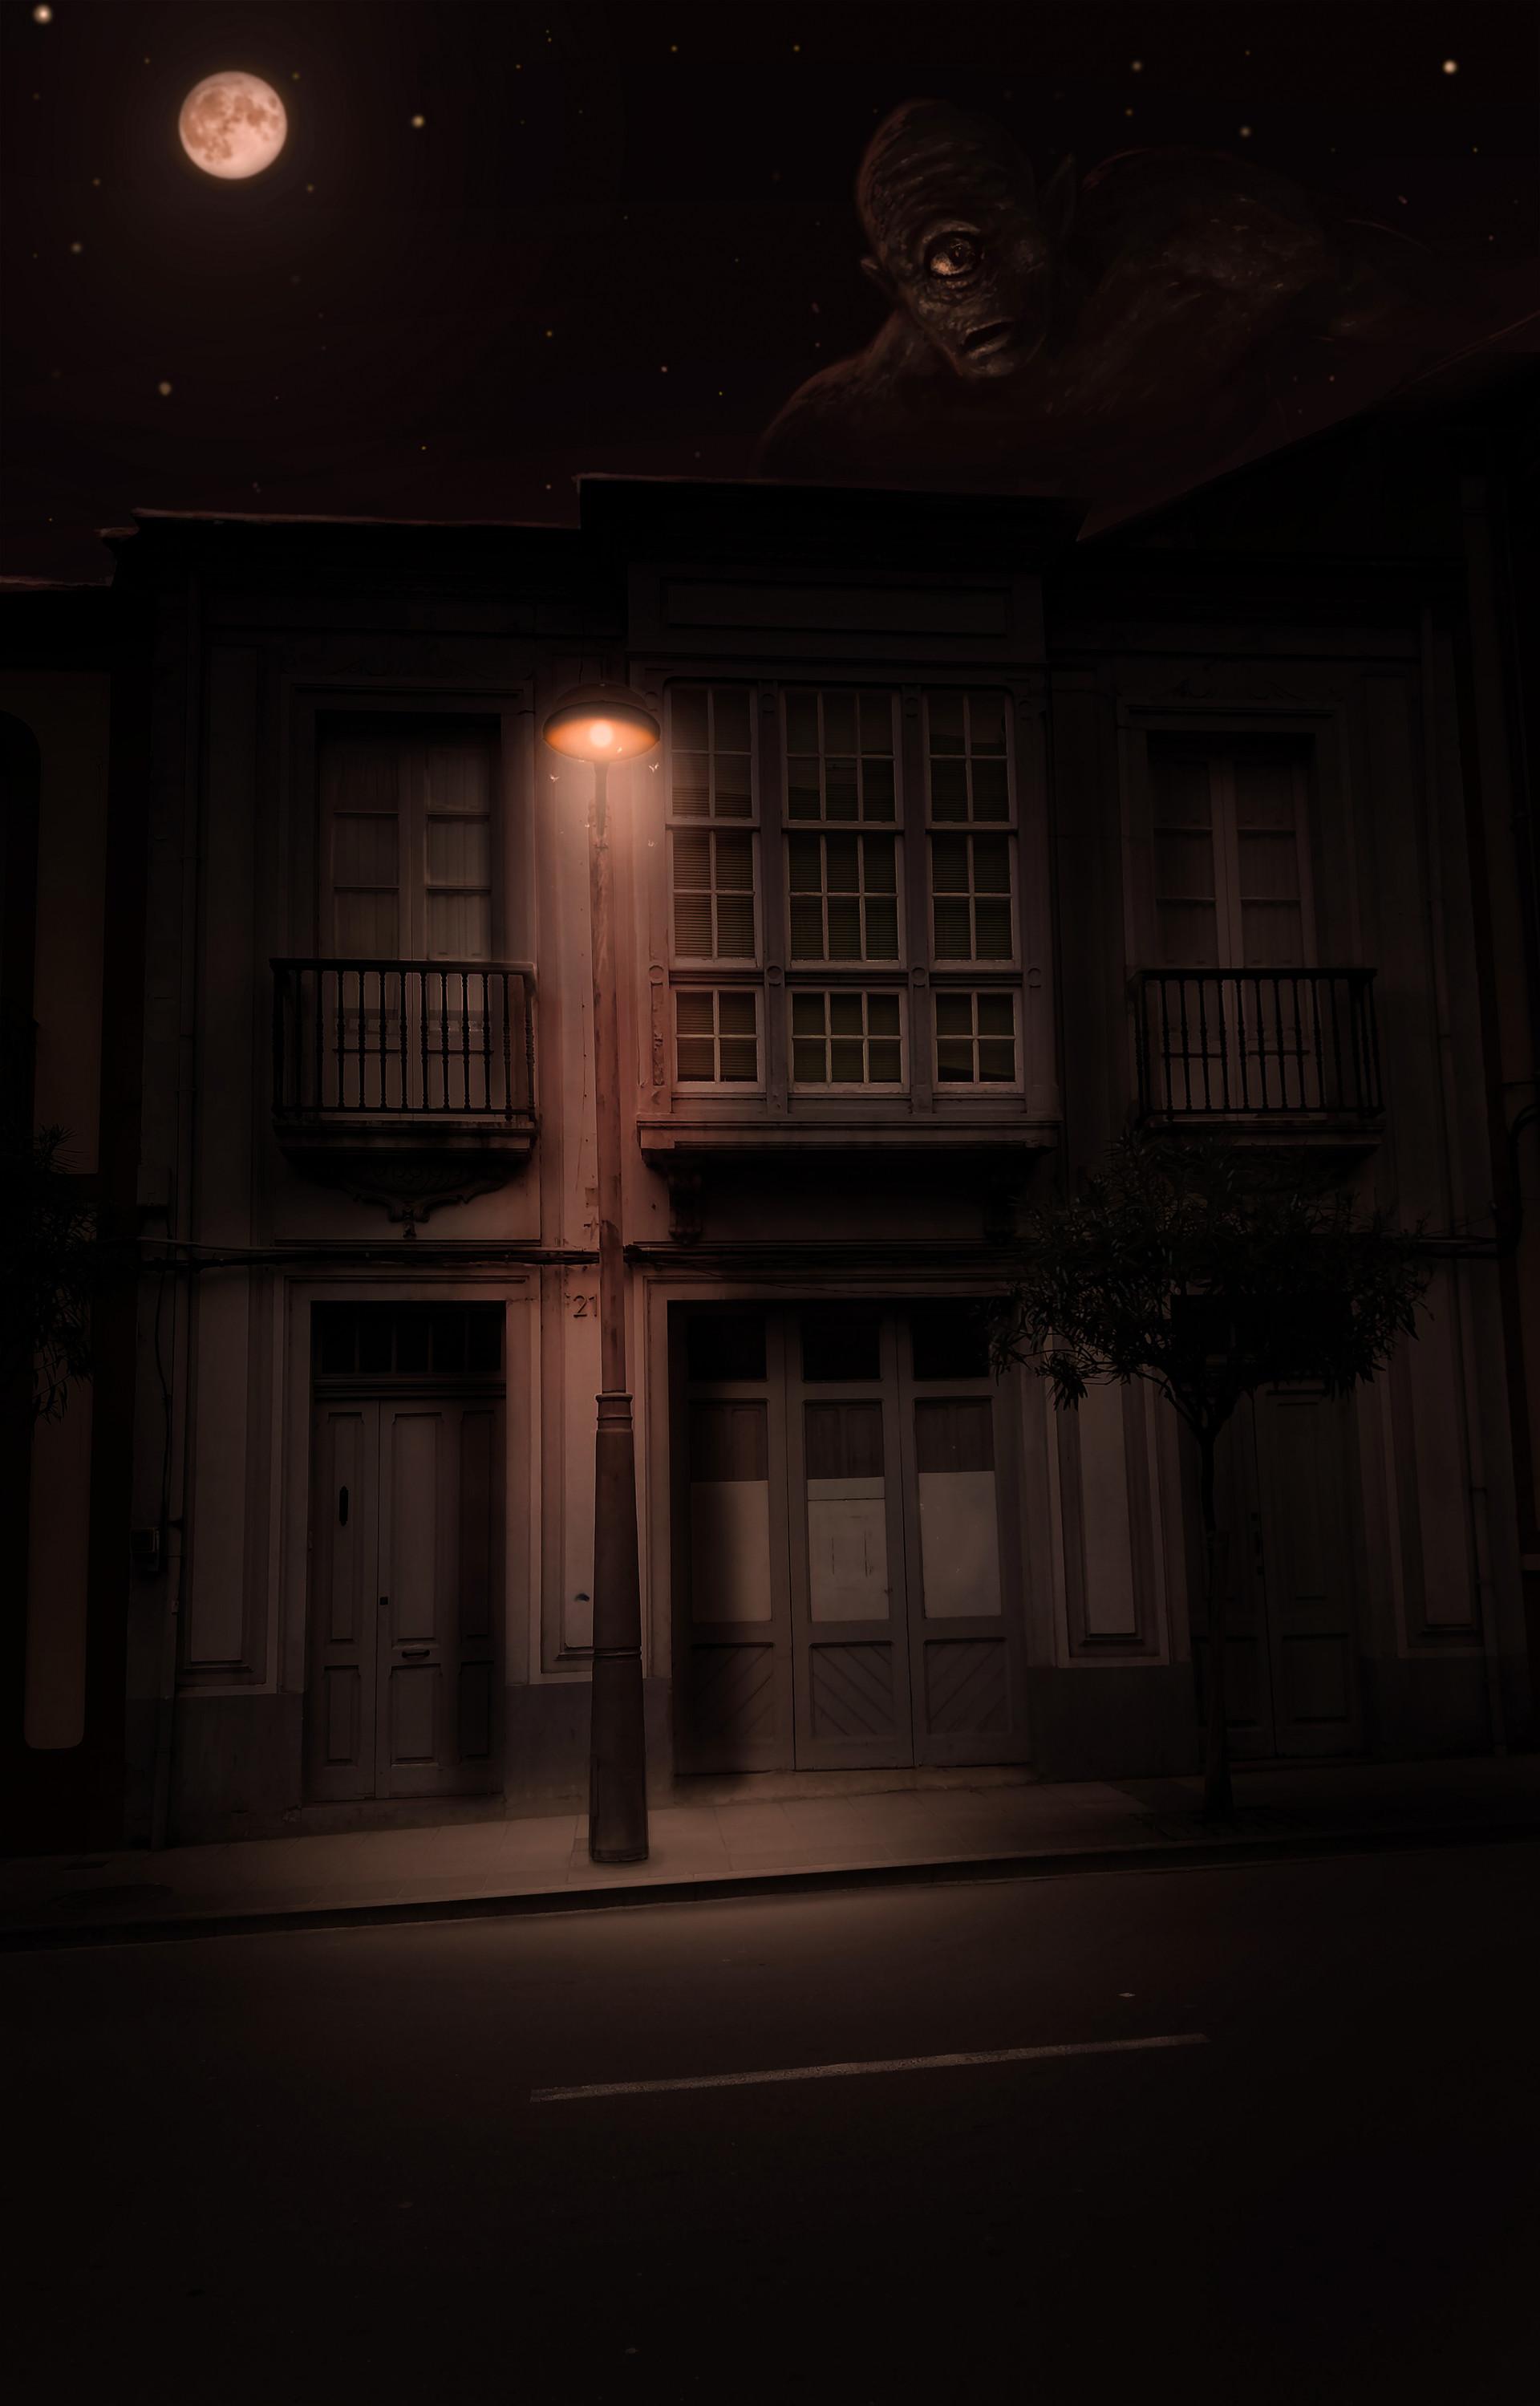 Lizartonne dani rodriguez palacios ciclope2